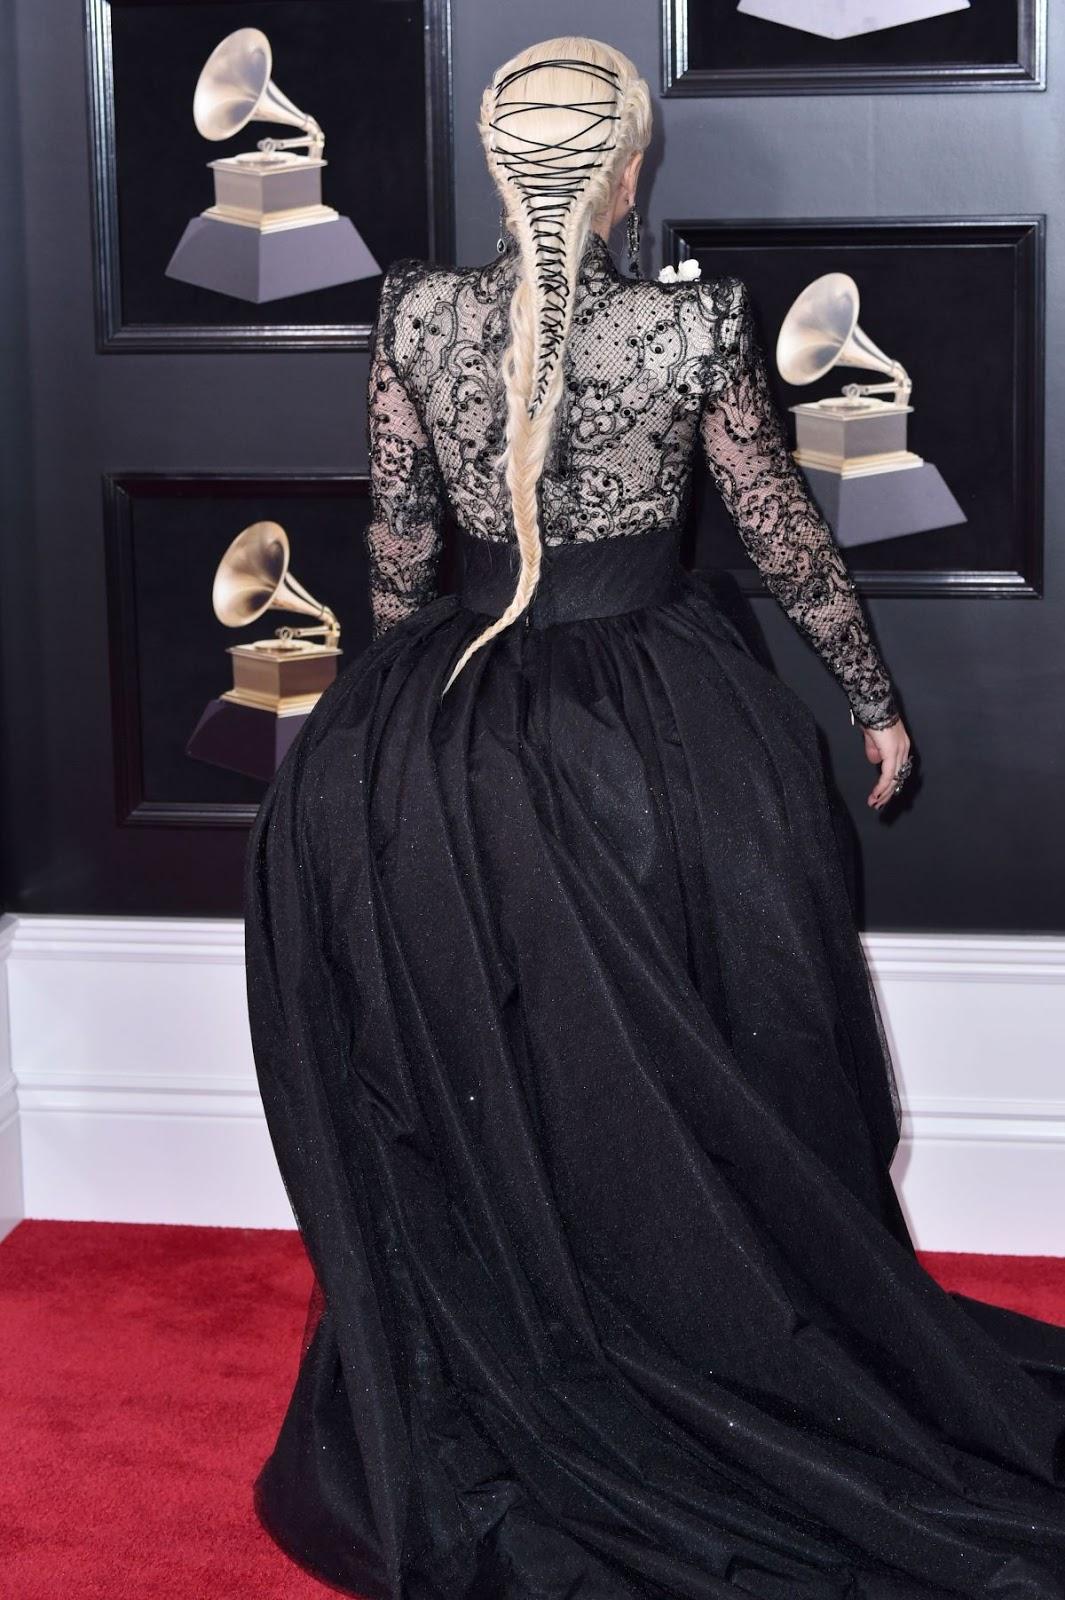 Lady Gaga flaunts dramatic ballgown at the 2018 Grammy Awards